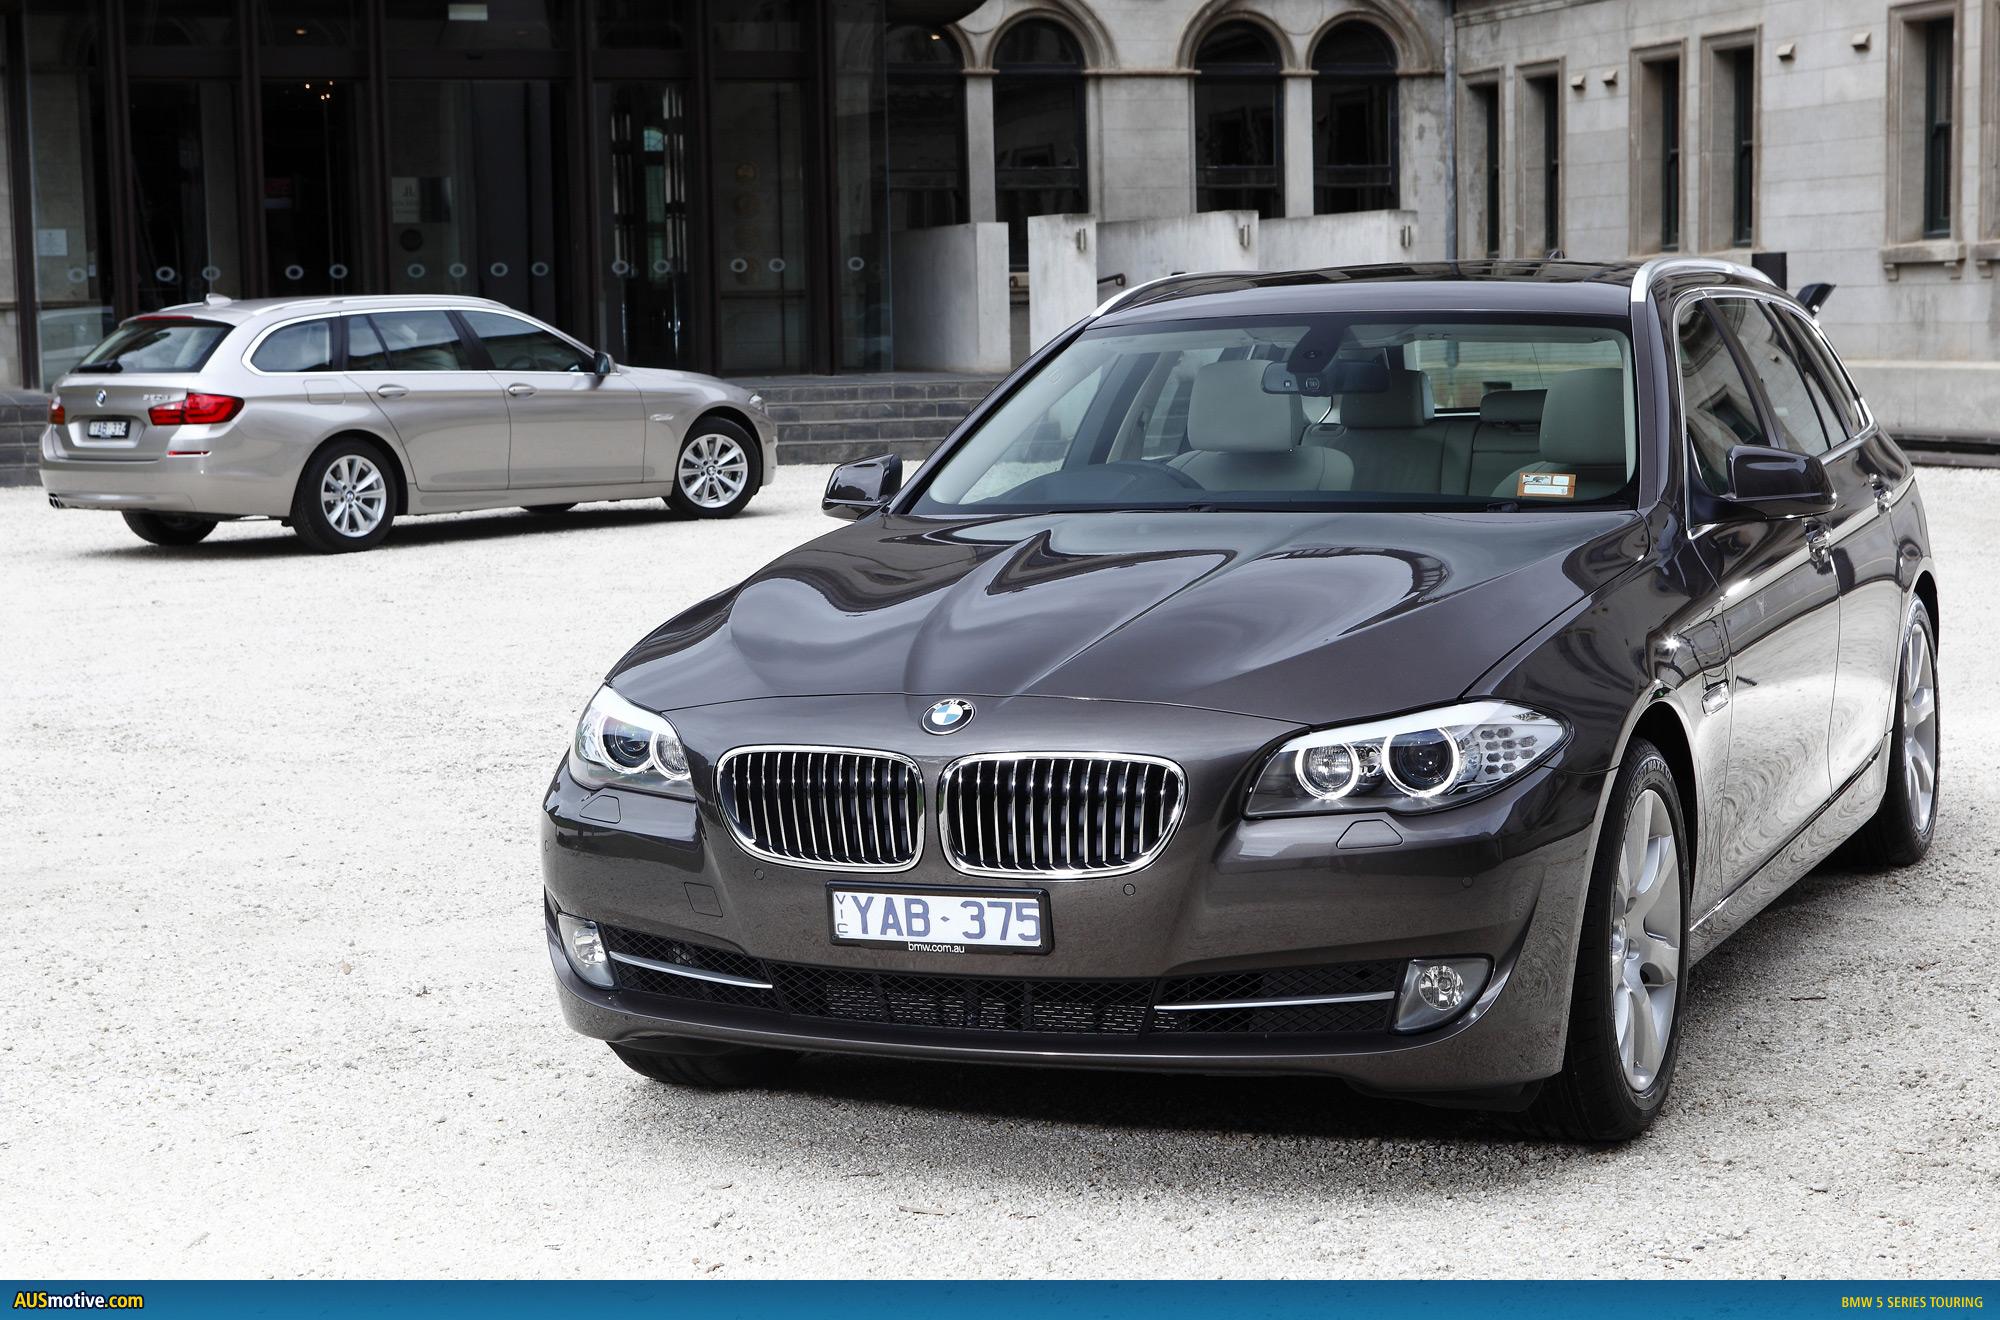 AUSmotive.com » BMW 5 Series Touring – Australian pricing & specs